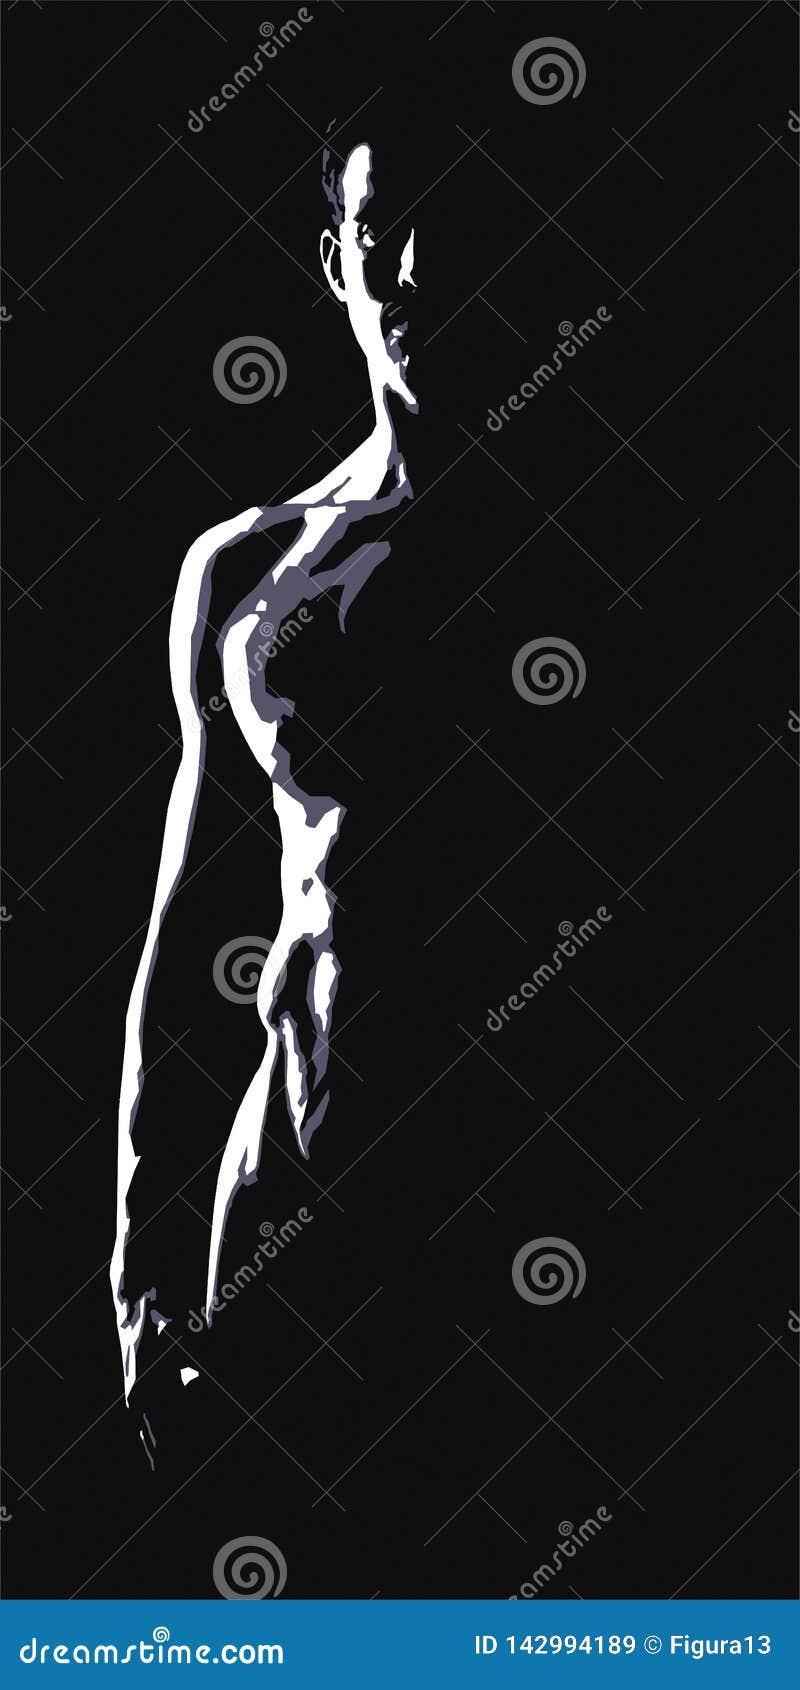 Nude κορμός ενός ατόμου σε ένα μαύρο υπόβαθρο